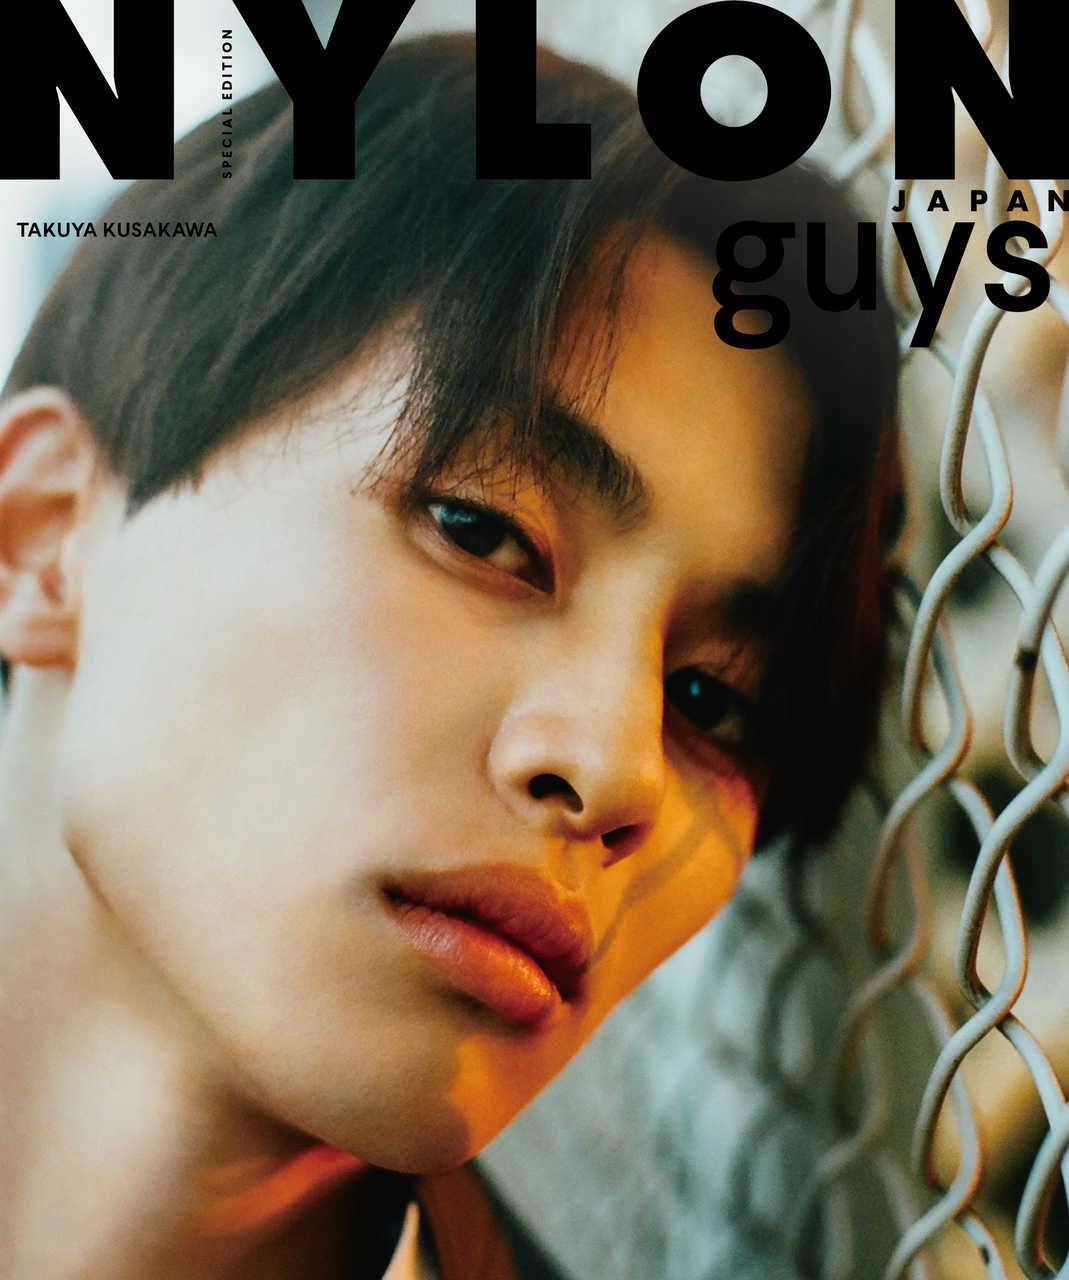 『NYLON guys JAPAN TAKUYA STYLE BOOK』【 HMV&BOOKS 限定版】